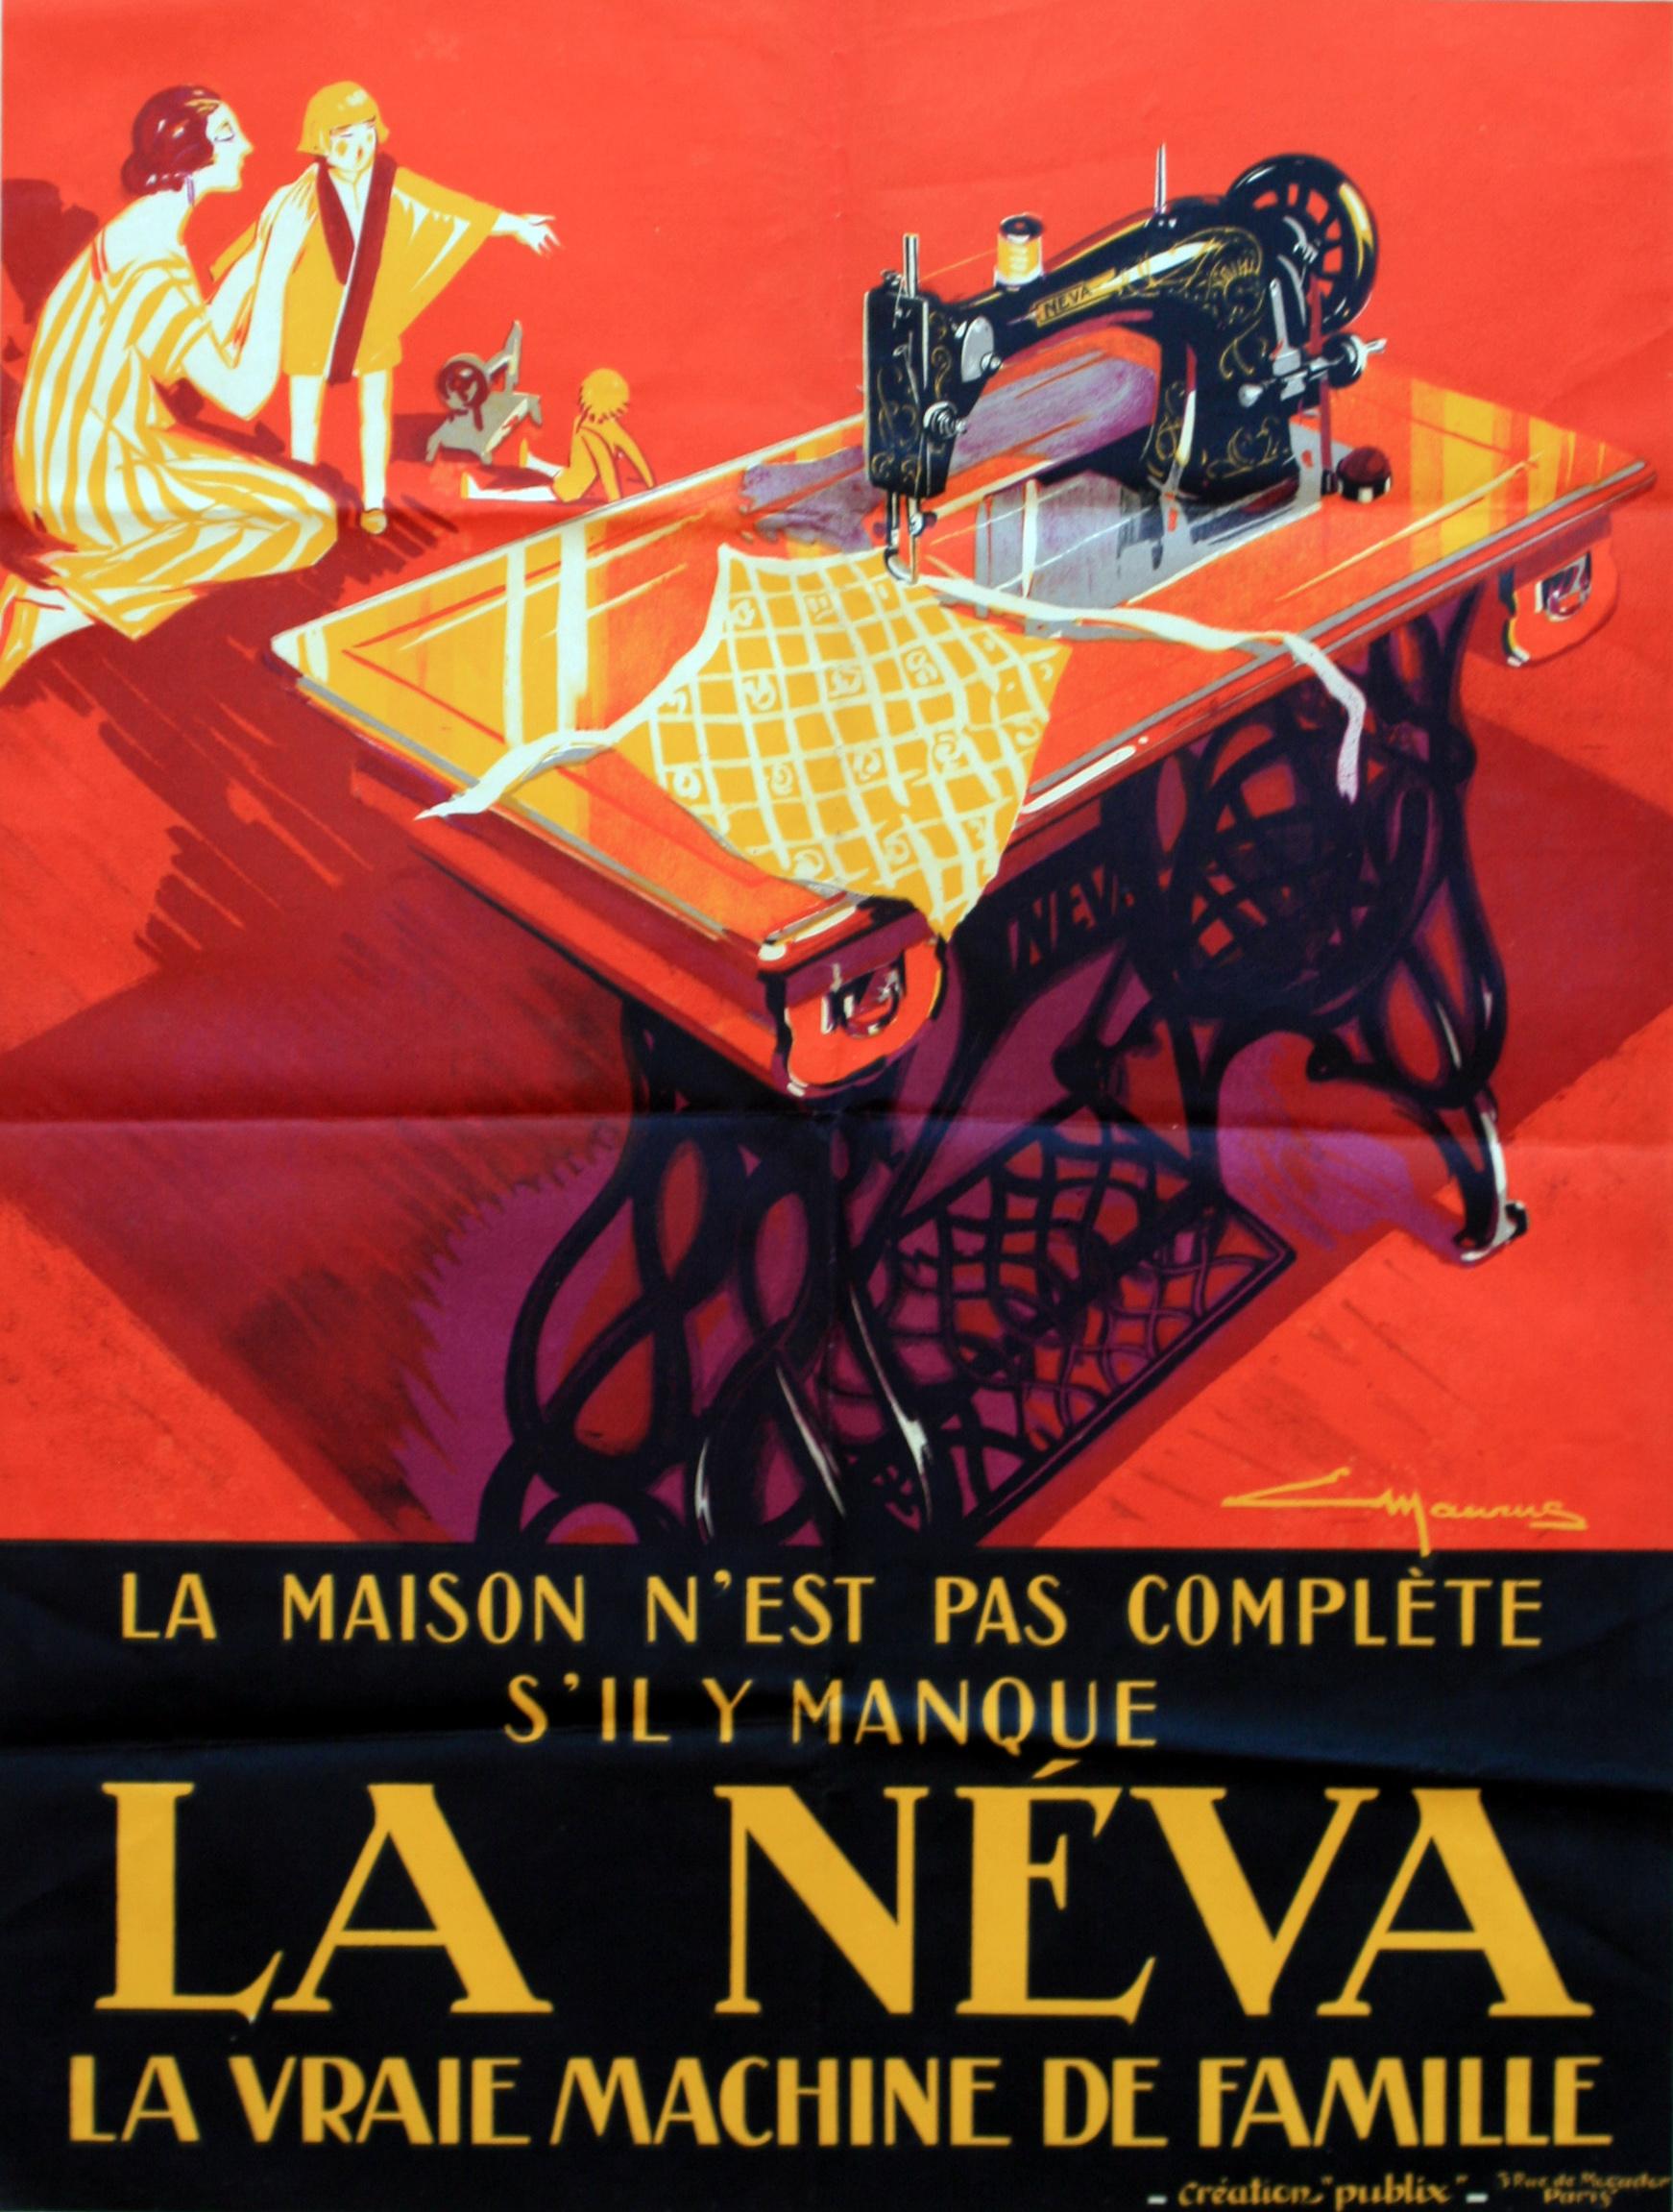 Lot 1201 - Advertising Poster La Neva Art Deco